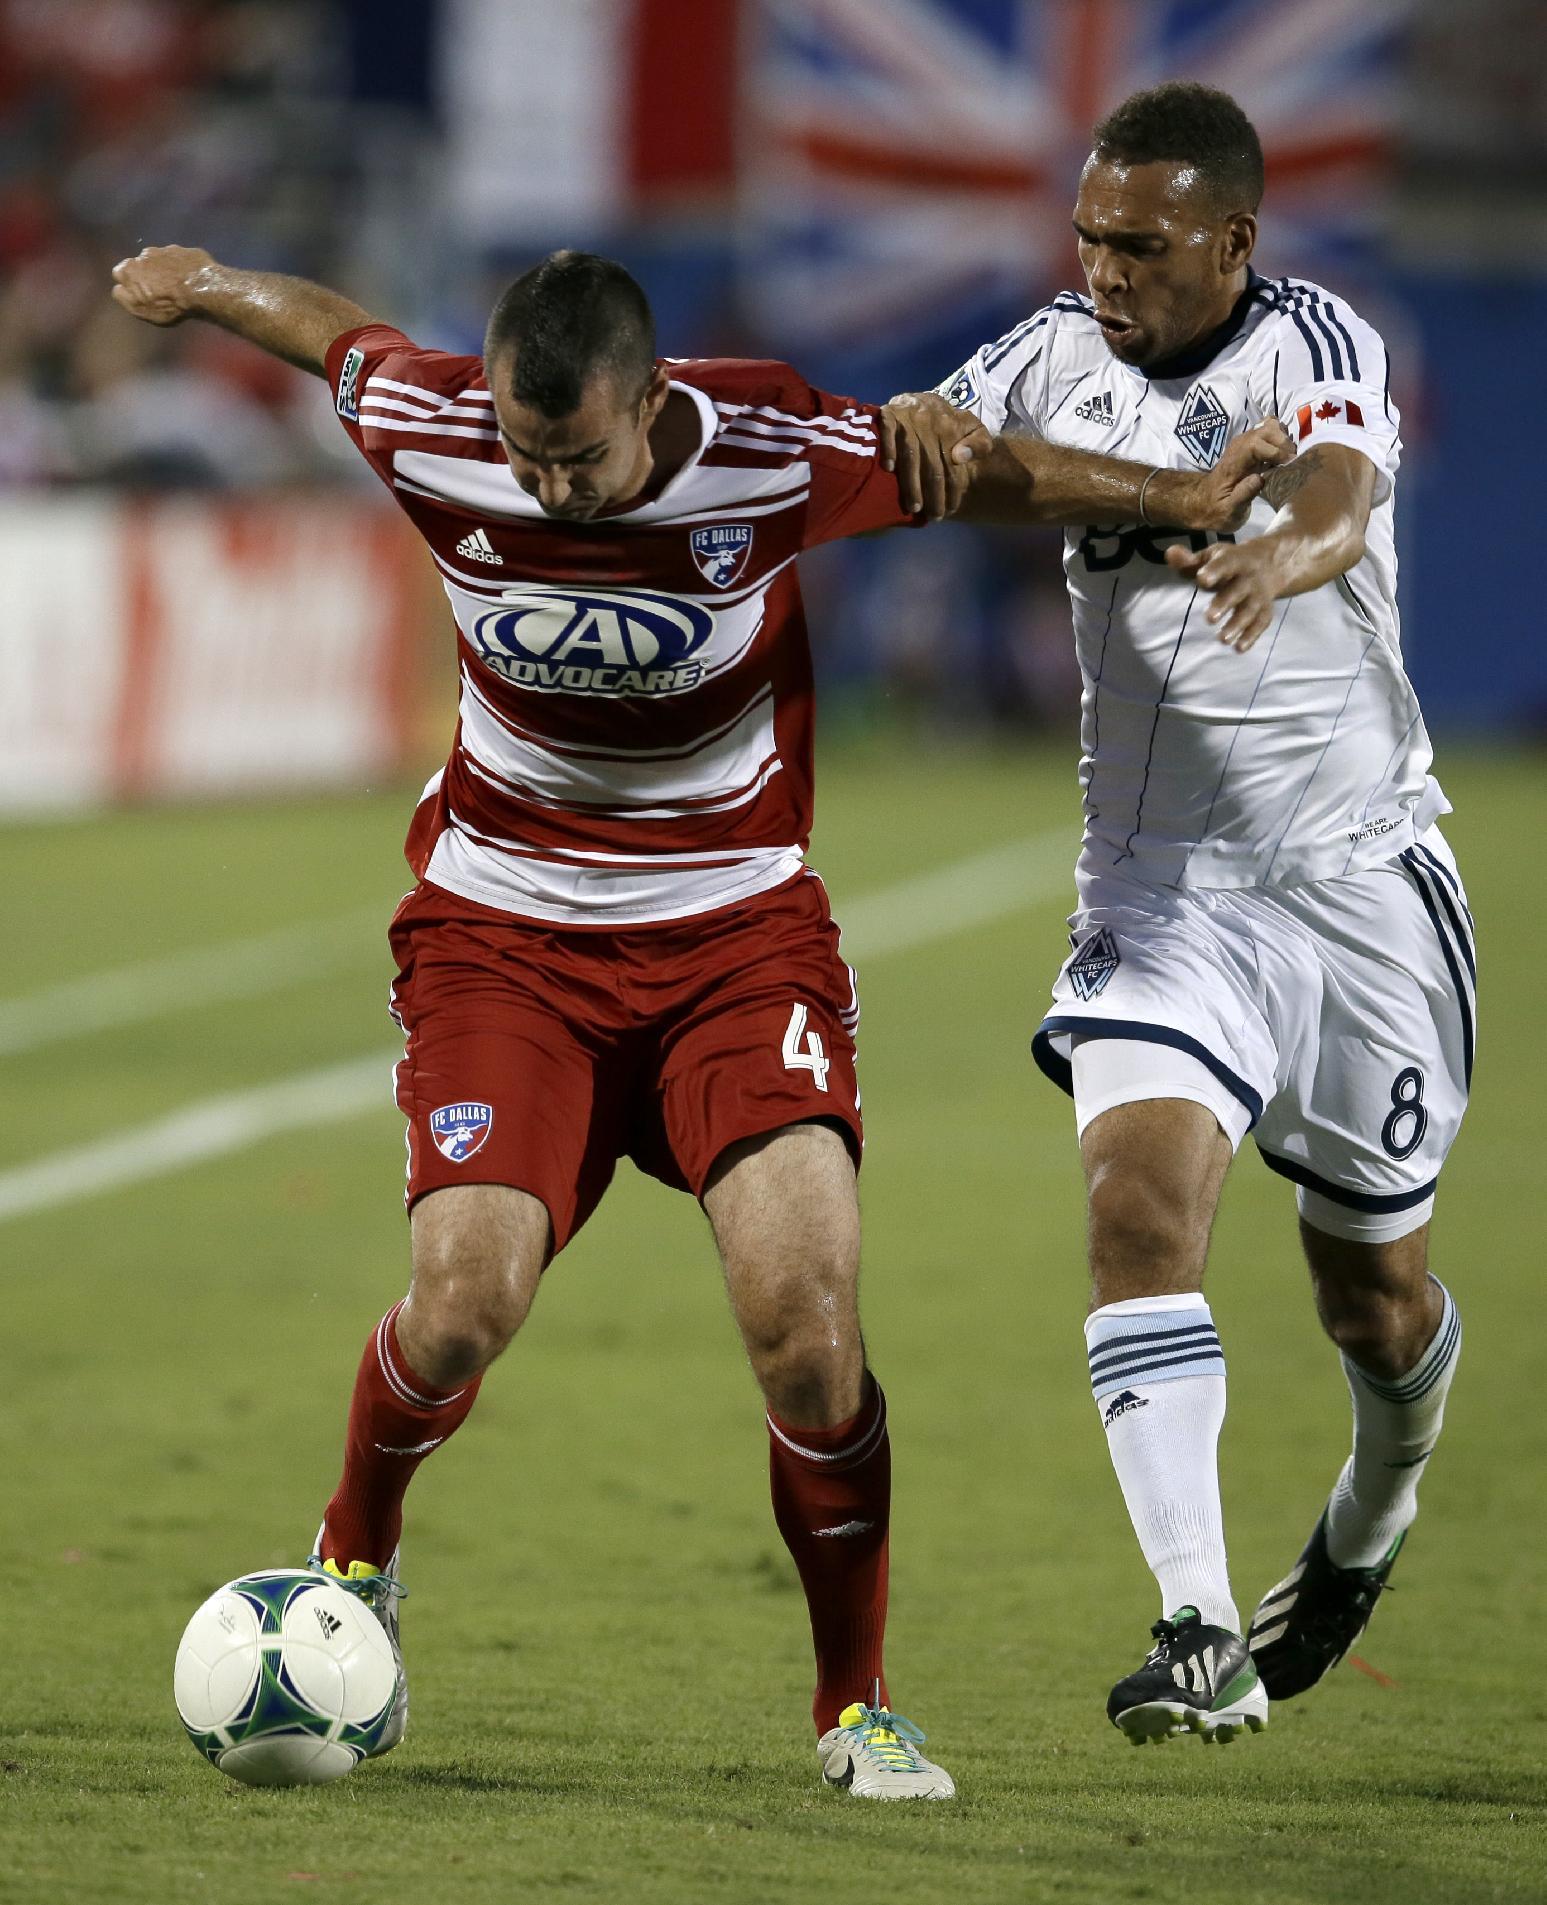 Diaz, Benitez lead FC Dallas past Whitecaps